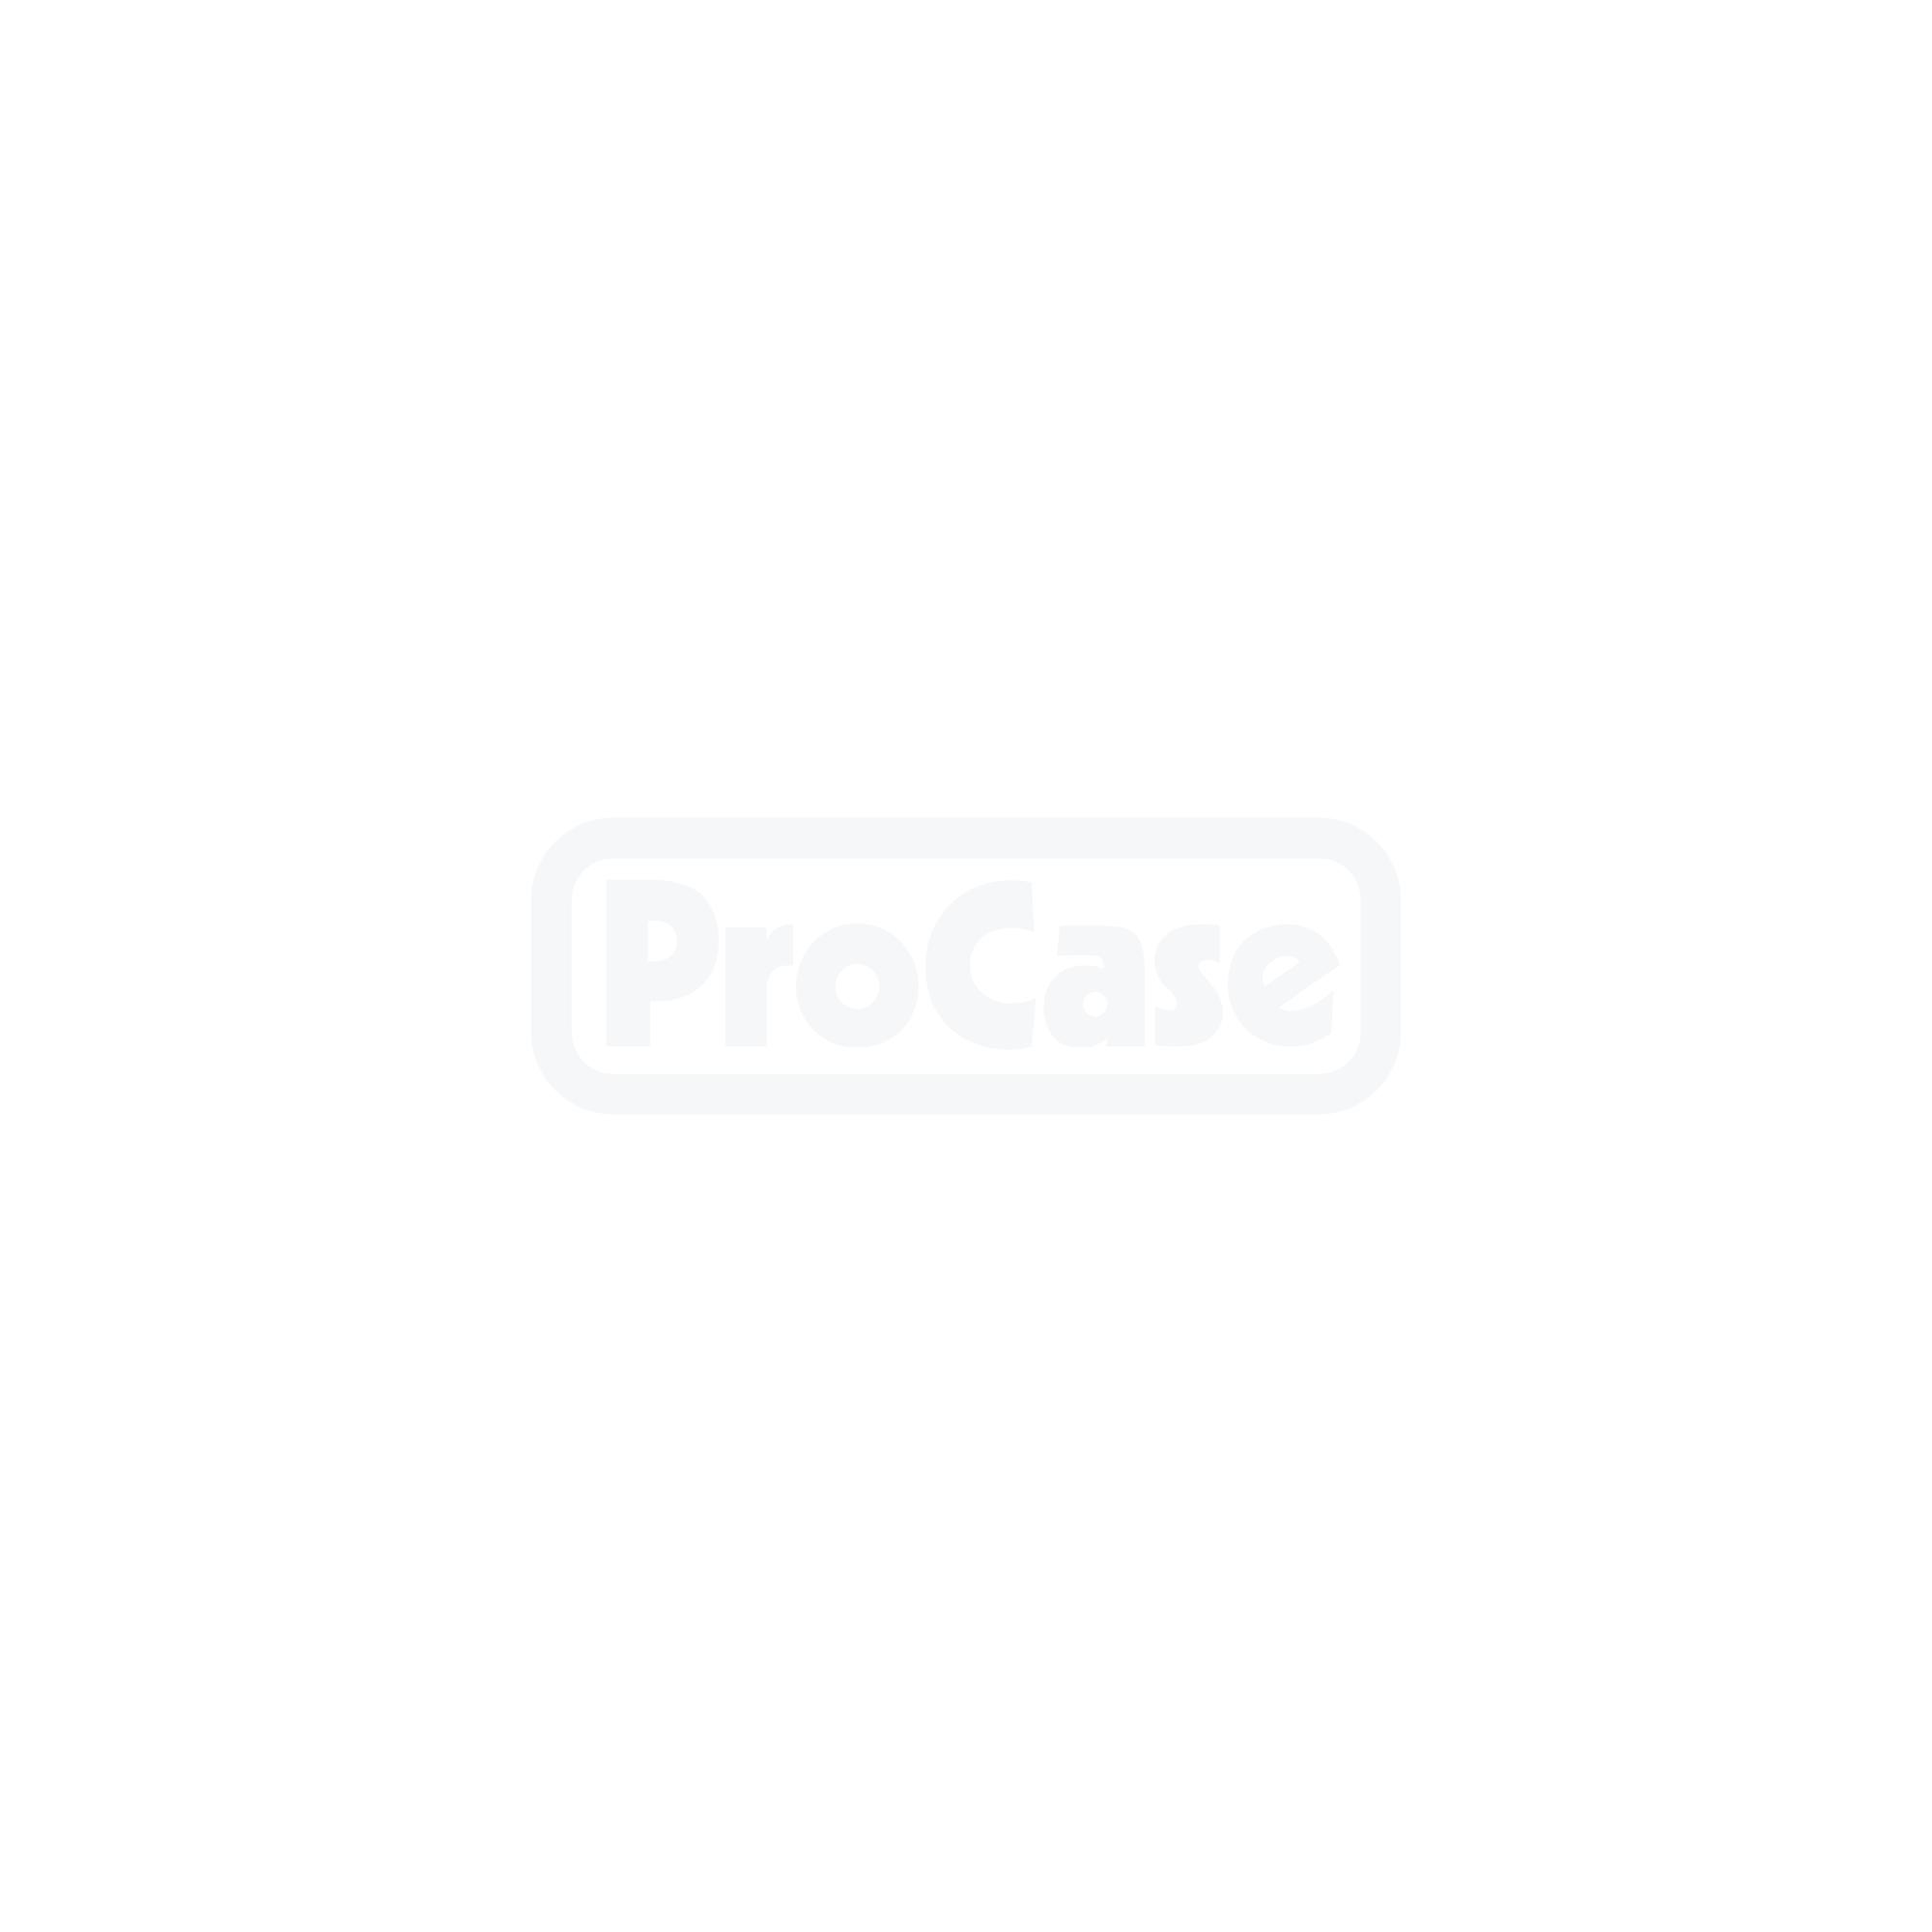 19 Zoll Standard-Rack 3HE ohne Deckel